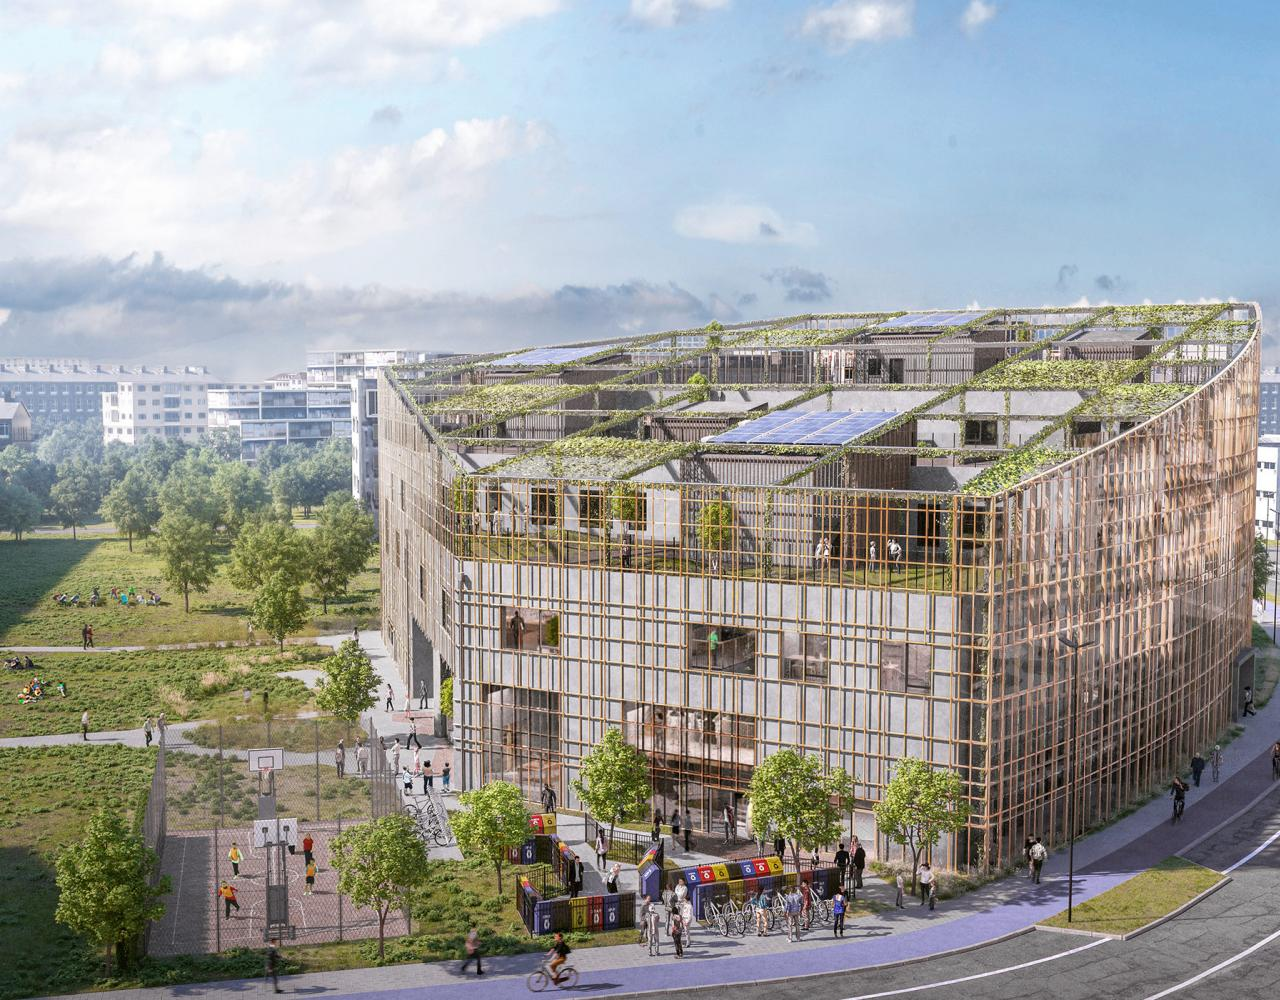 Sydhavnens Skole tilbygning overblik